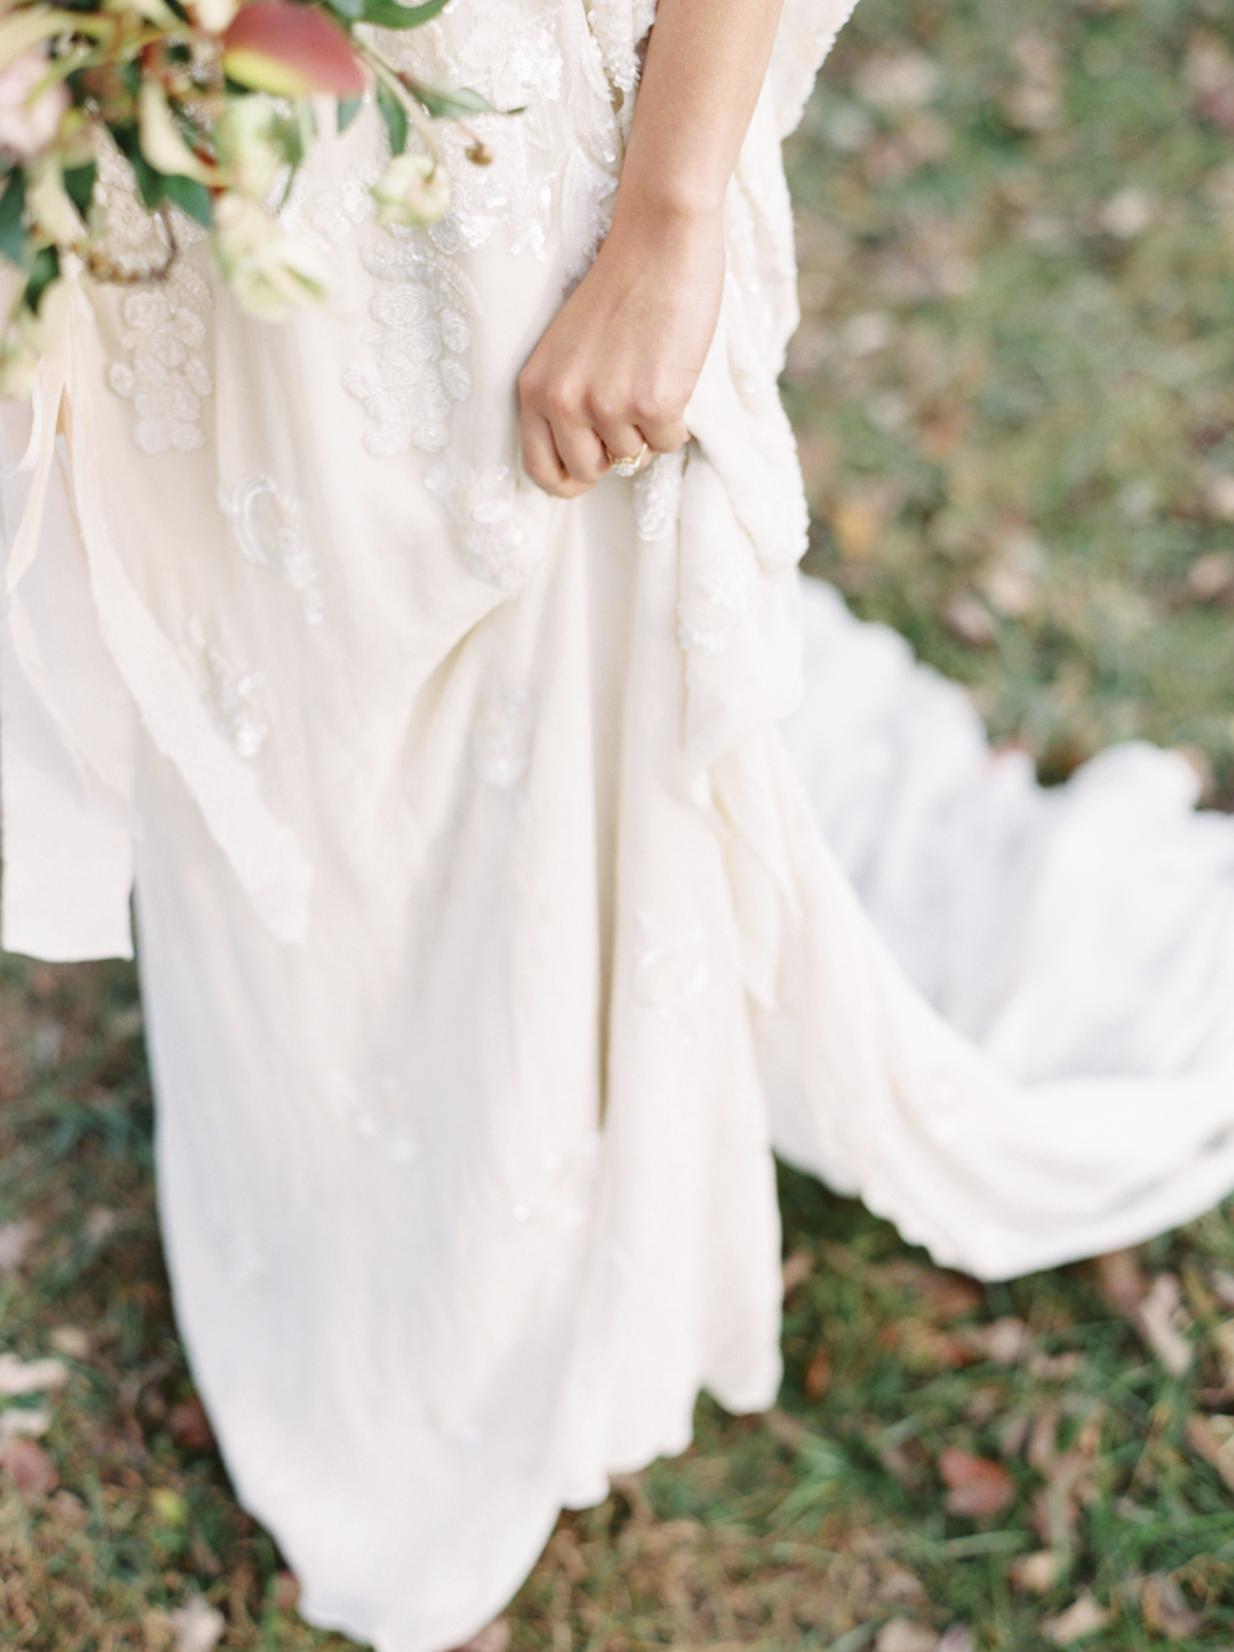 Carol Hannah Bridal Iolite Gown Shanon Moffit Photography 11.png